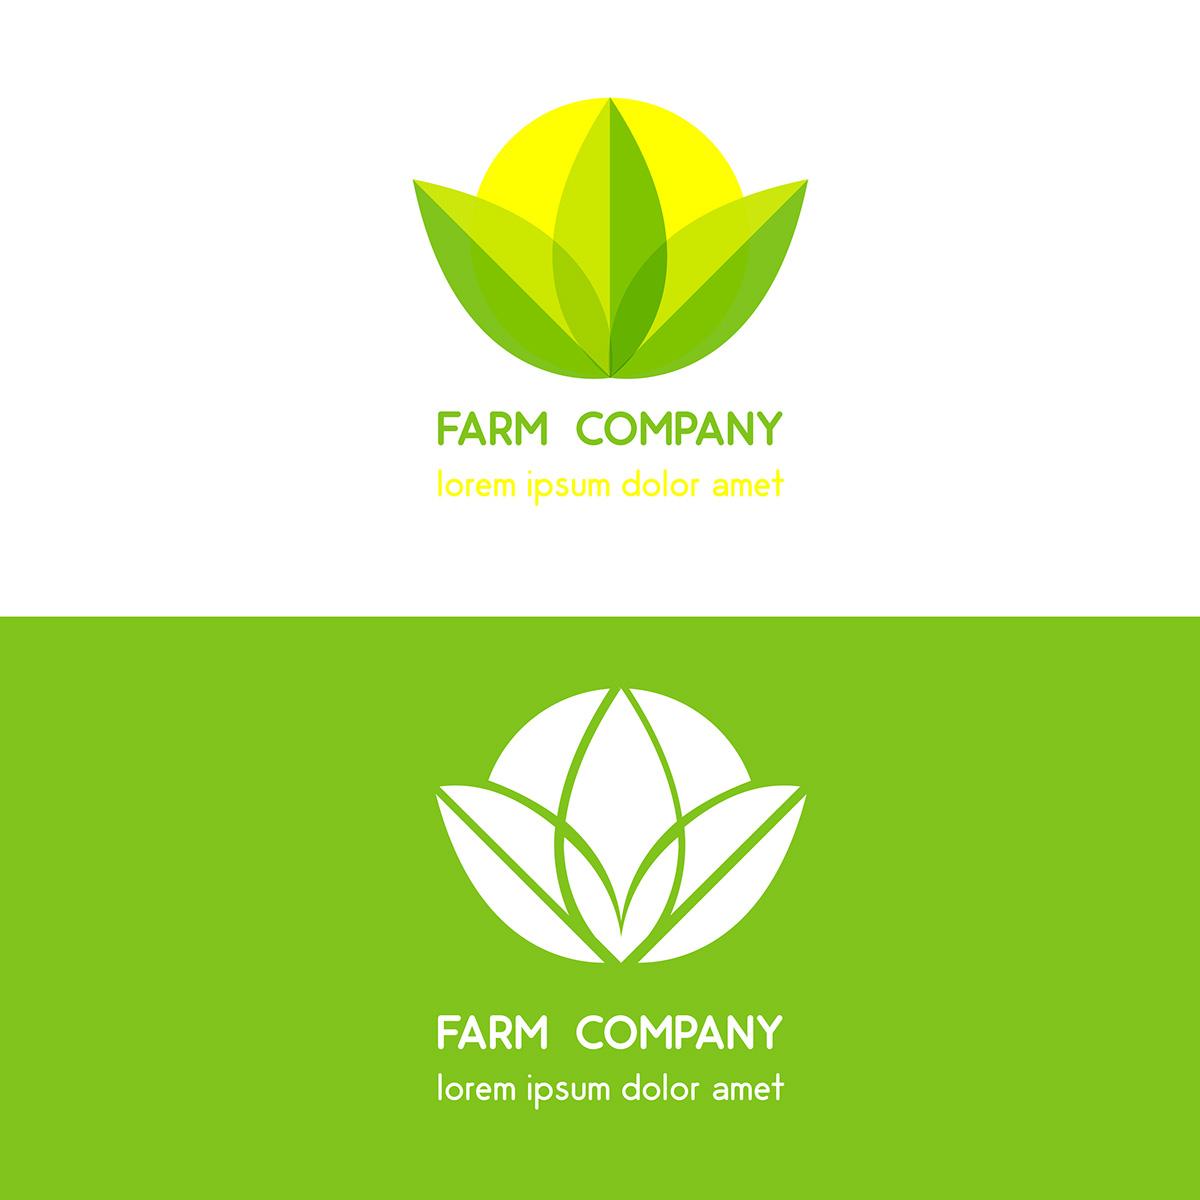 shutter stock illustrations logos